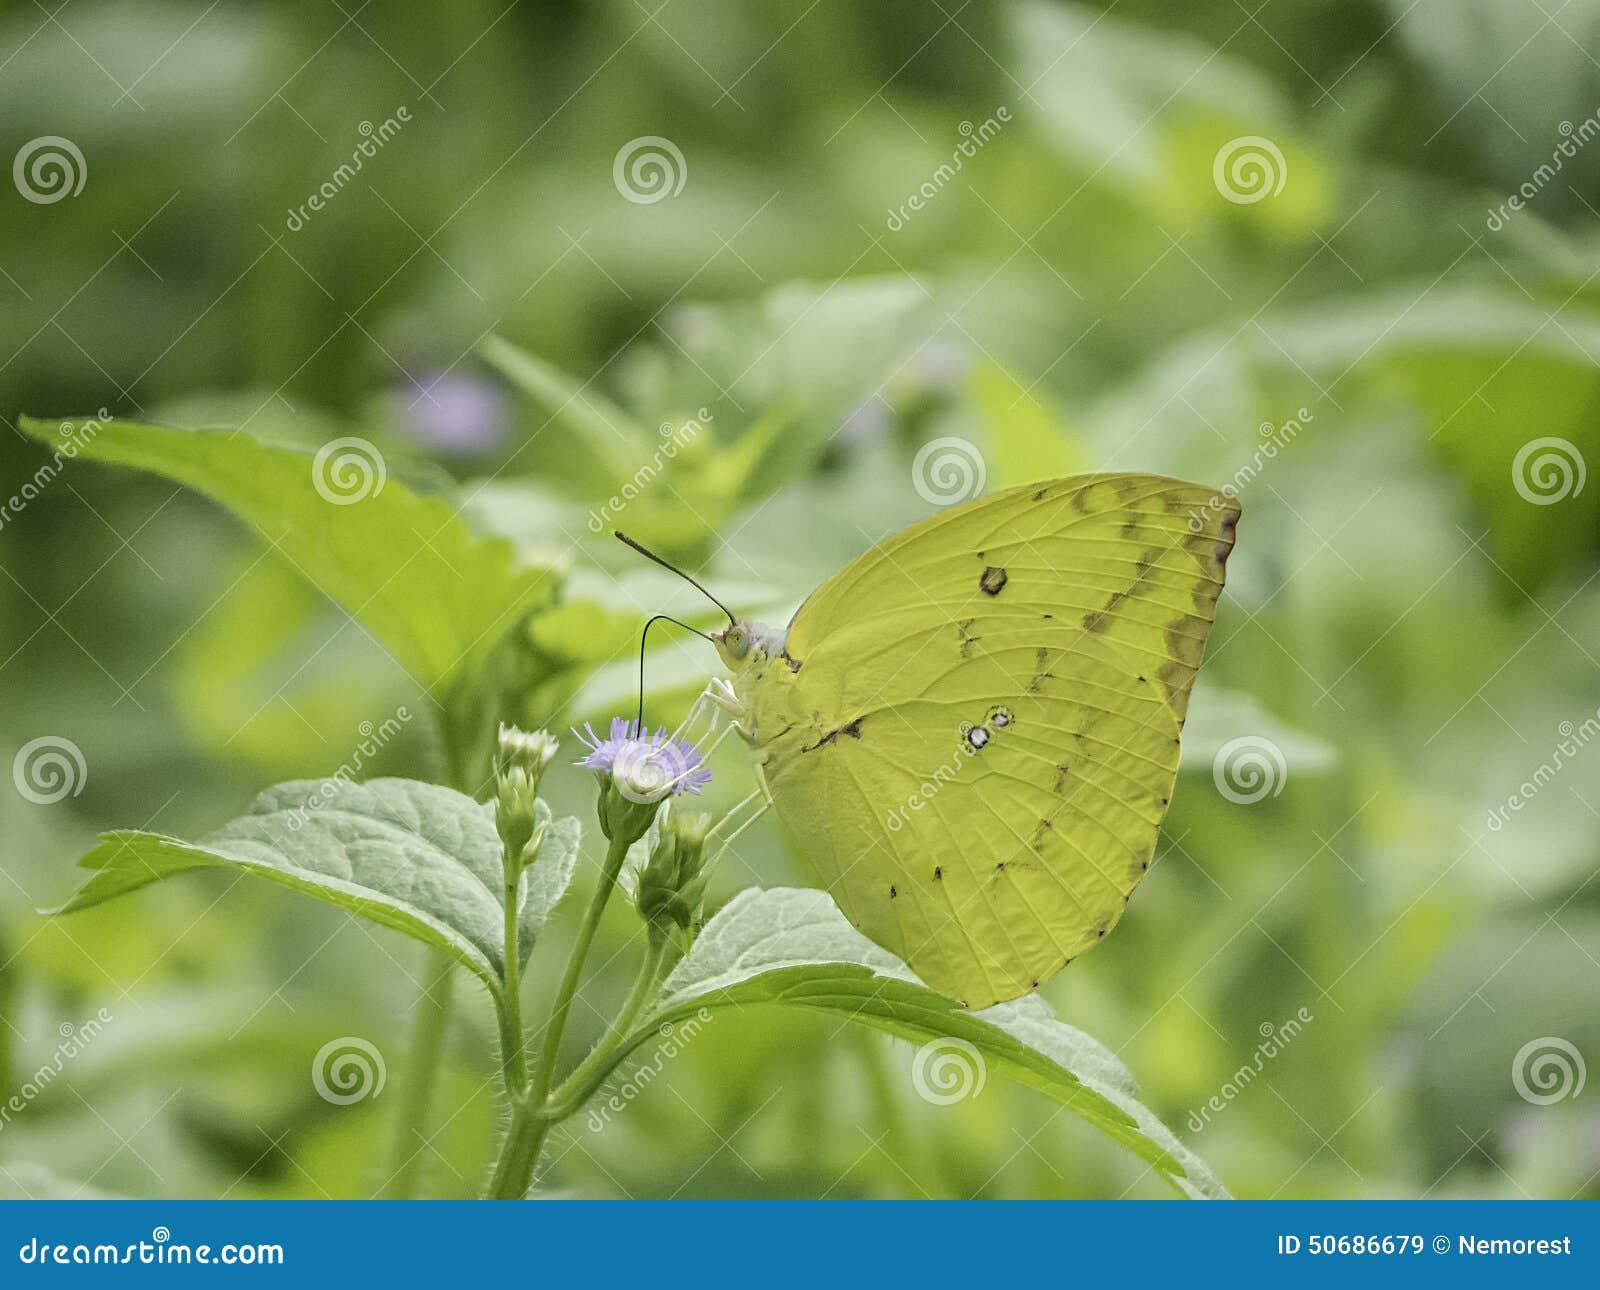 Download 蝴蝶 库存图片. 图片 包括有 放大, 热带, 昆虫, 本质, 飞行, 野生生物, 茴香, 昆虫学, 扩大化 - 50686679